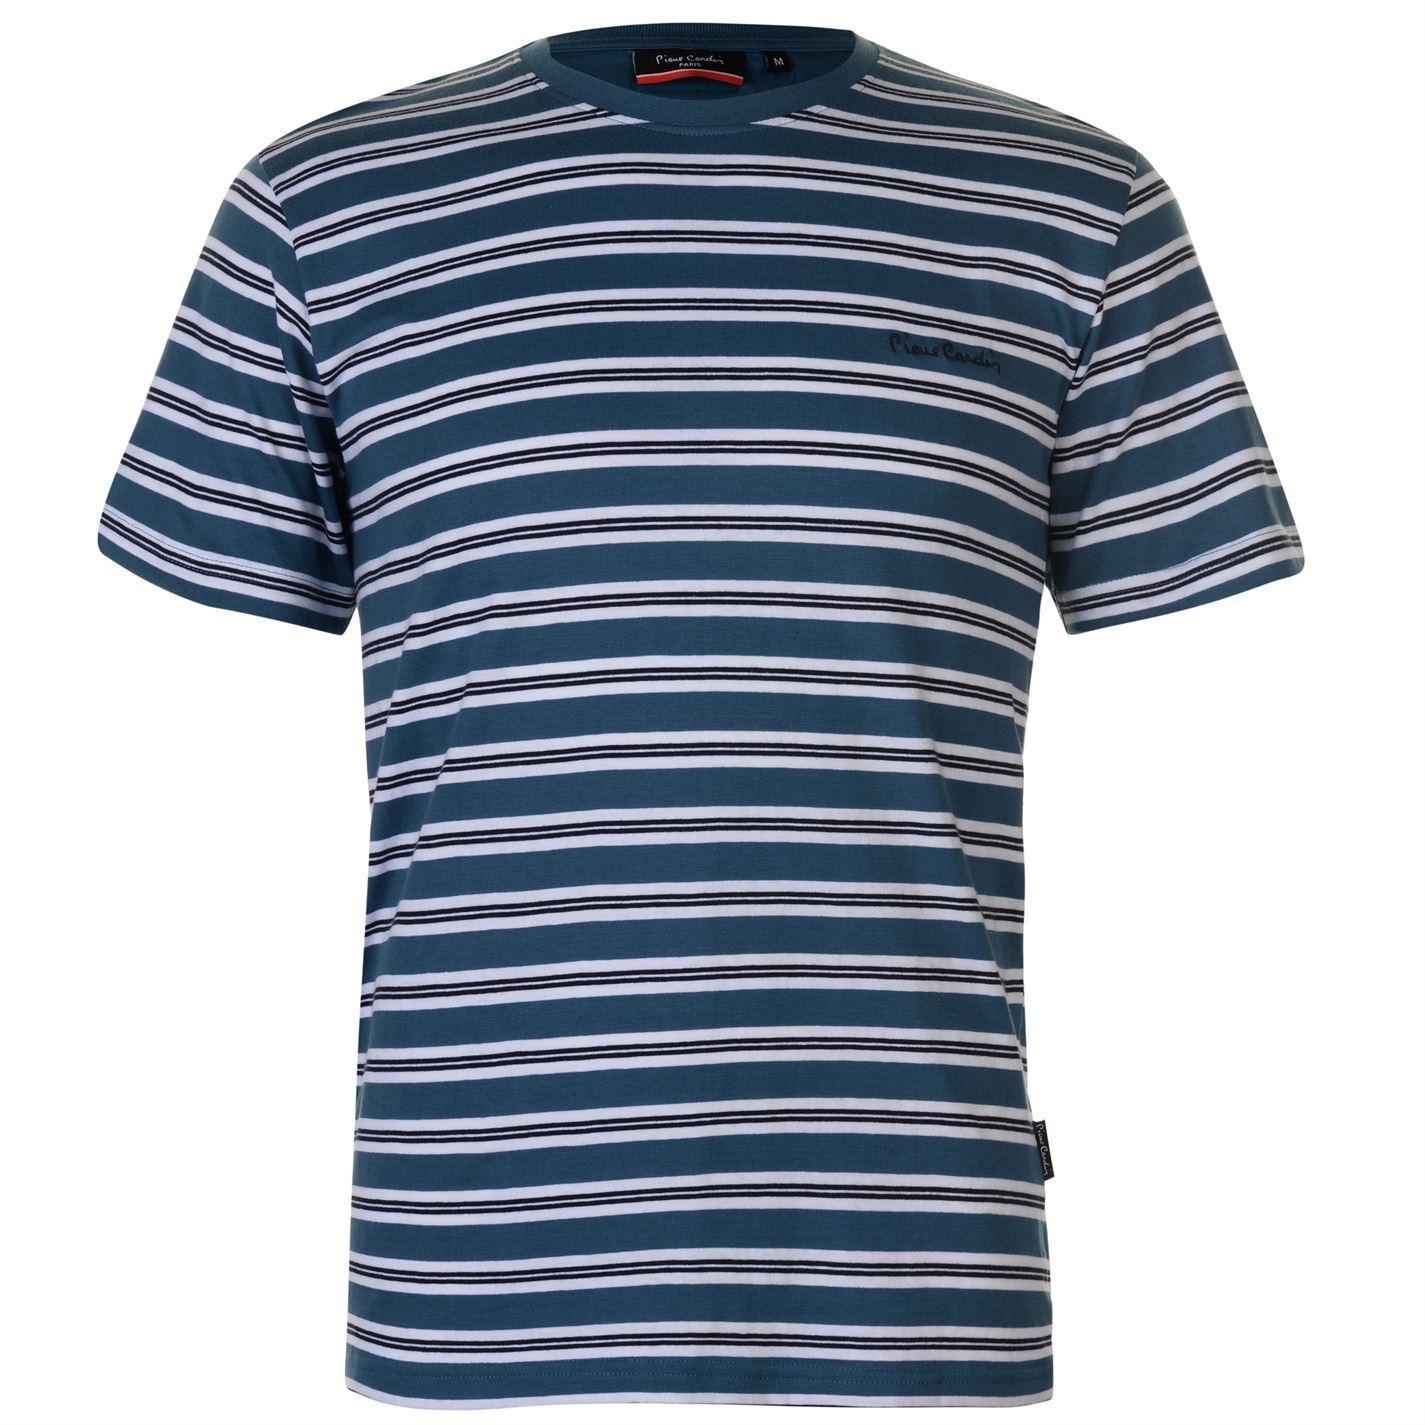 e9a2136ac6 Details about Pierre Cardin Striped T-Shirt Mens Blue/White Tee Shirt Tshirt  Top